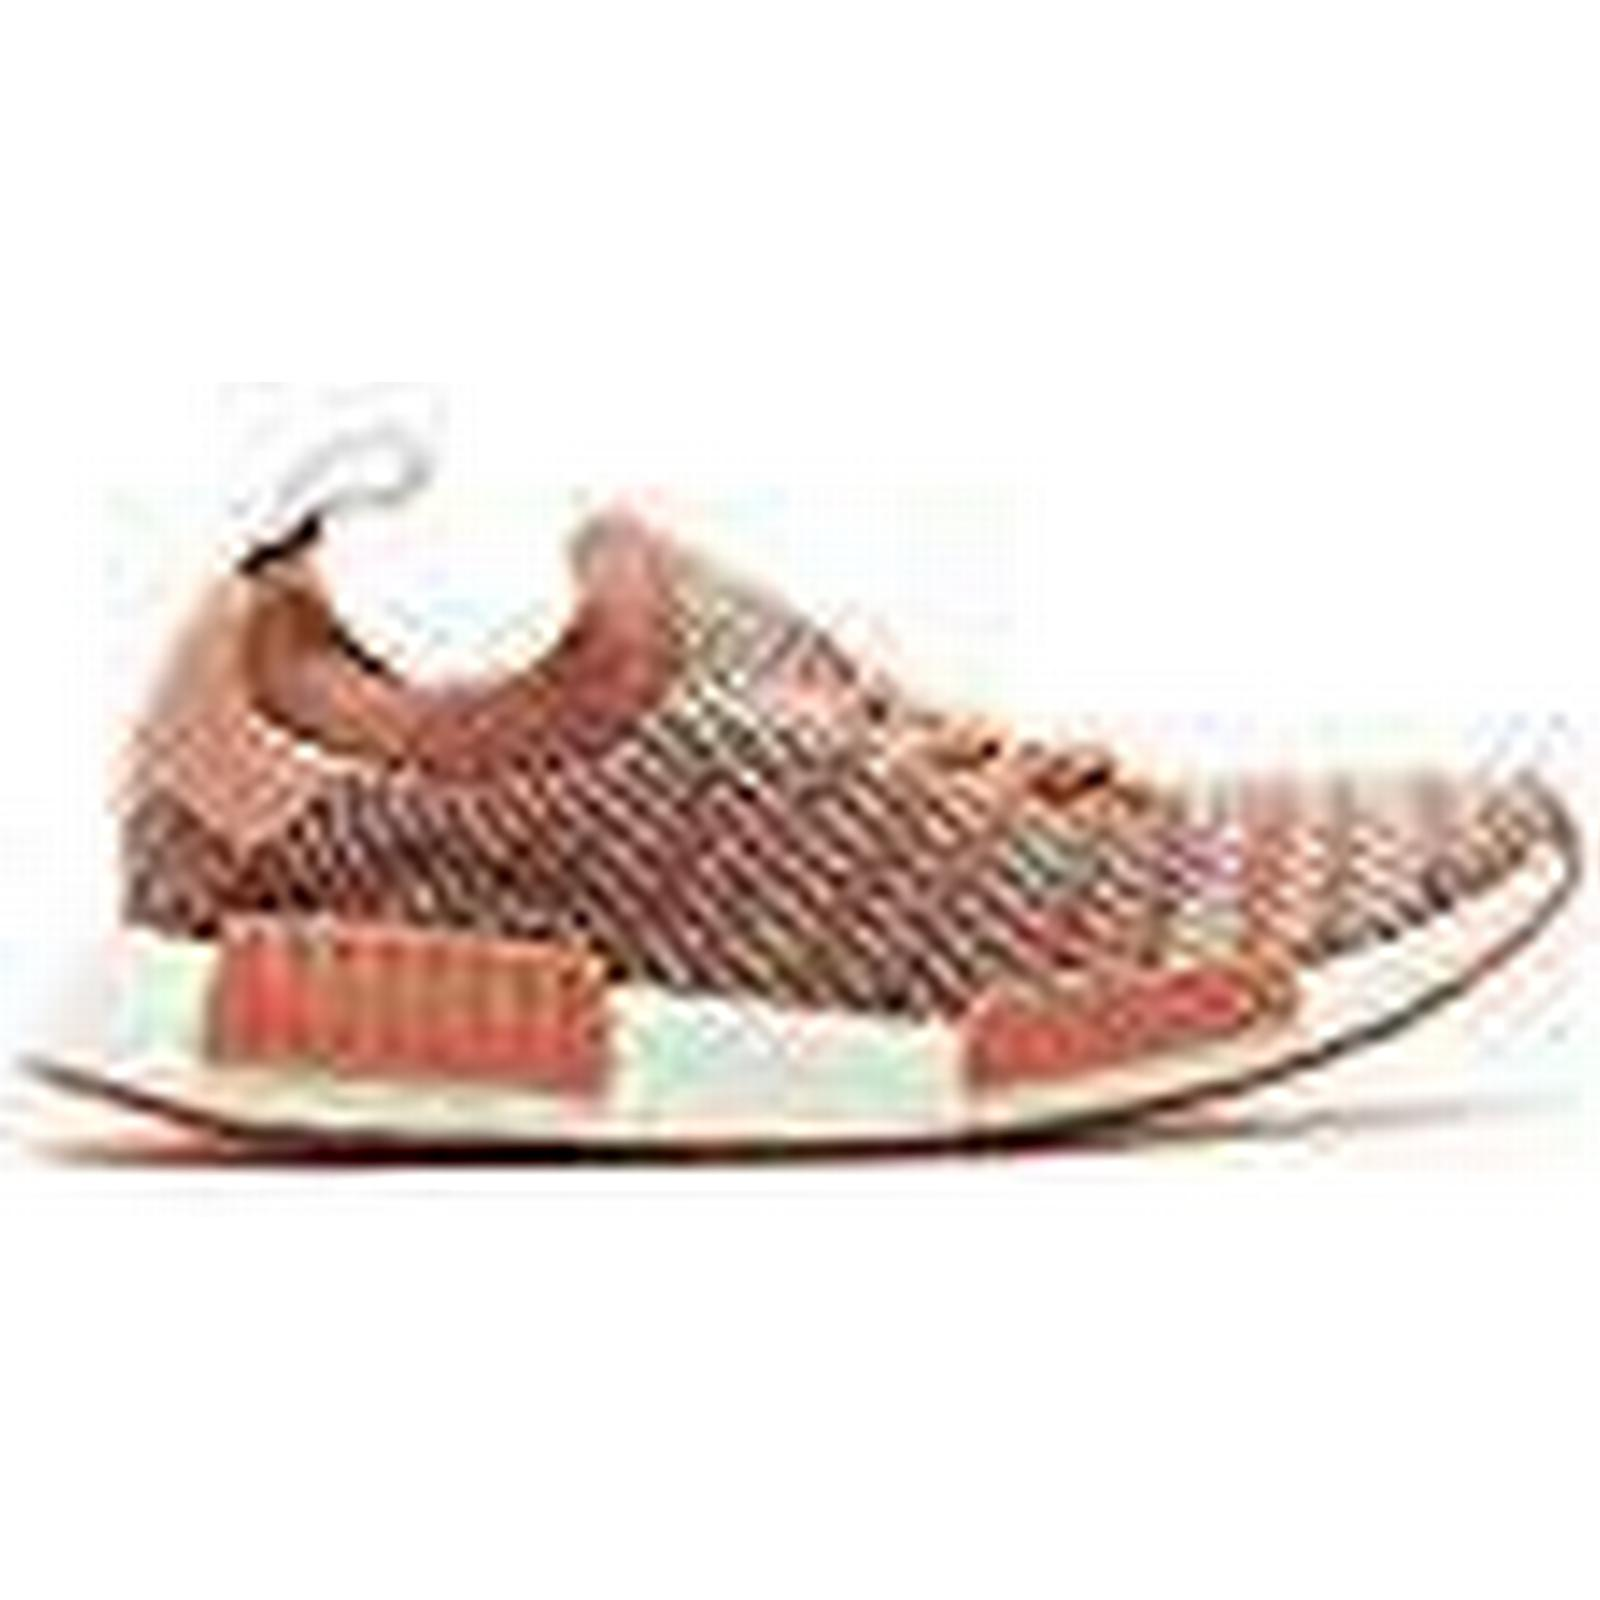 Adidas Women''s NMD_r1 Stlt Primeknit Low-Top Sneakers, (Ash Pink/Orchid Tint/Footwear 7.5 White 0), 7.5 UK 7.5 Tint/Footwear UK ac3e51